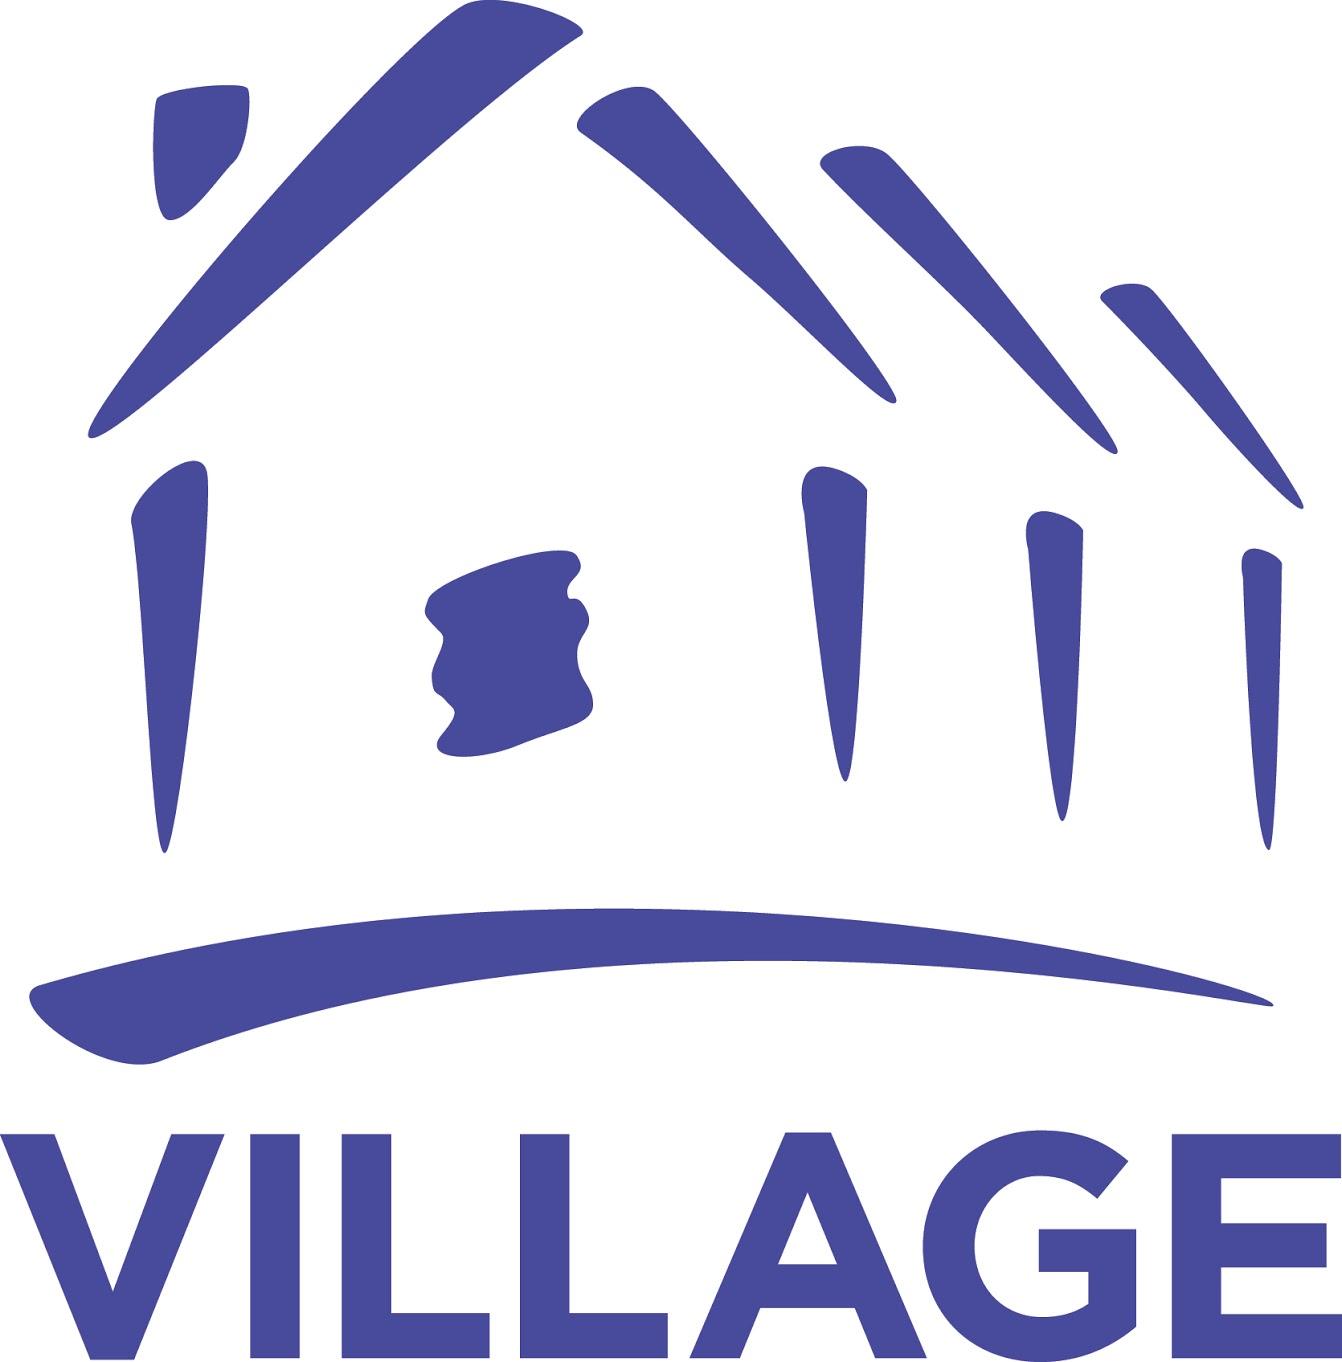 Village-logo-white-background.jpg